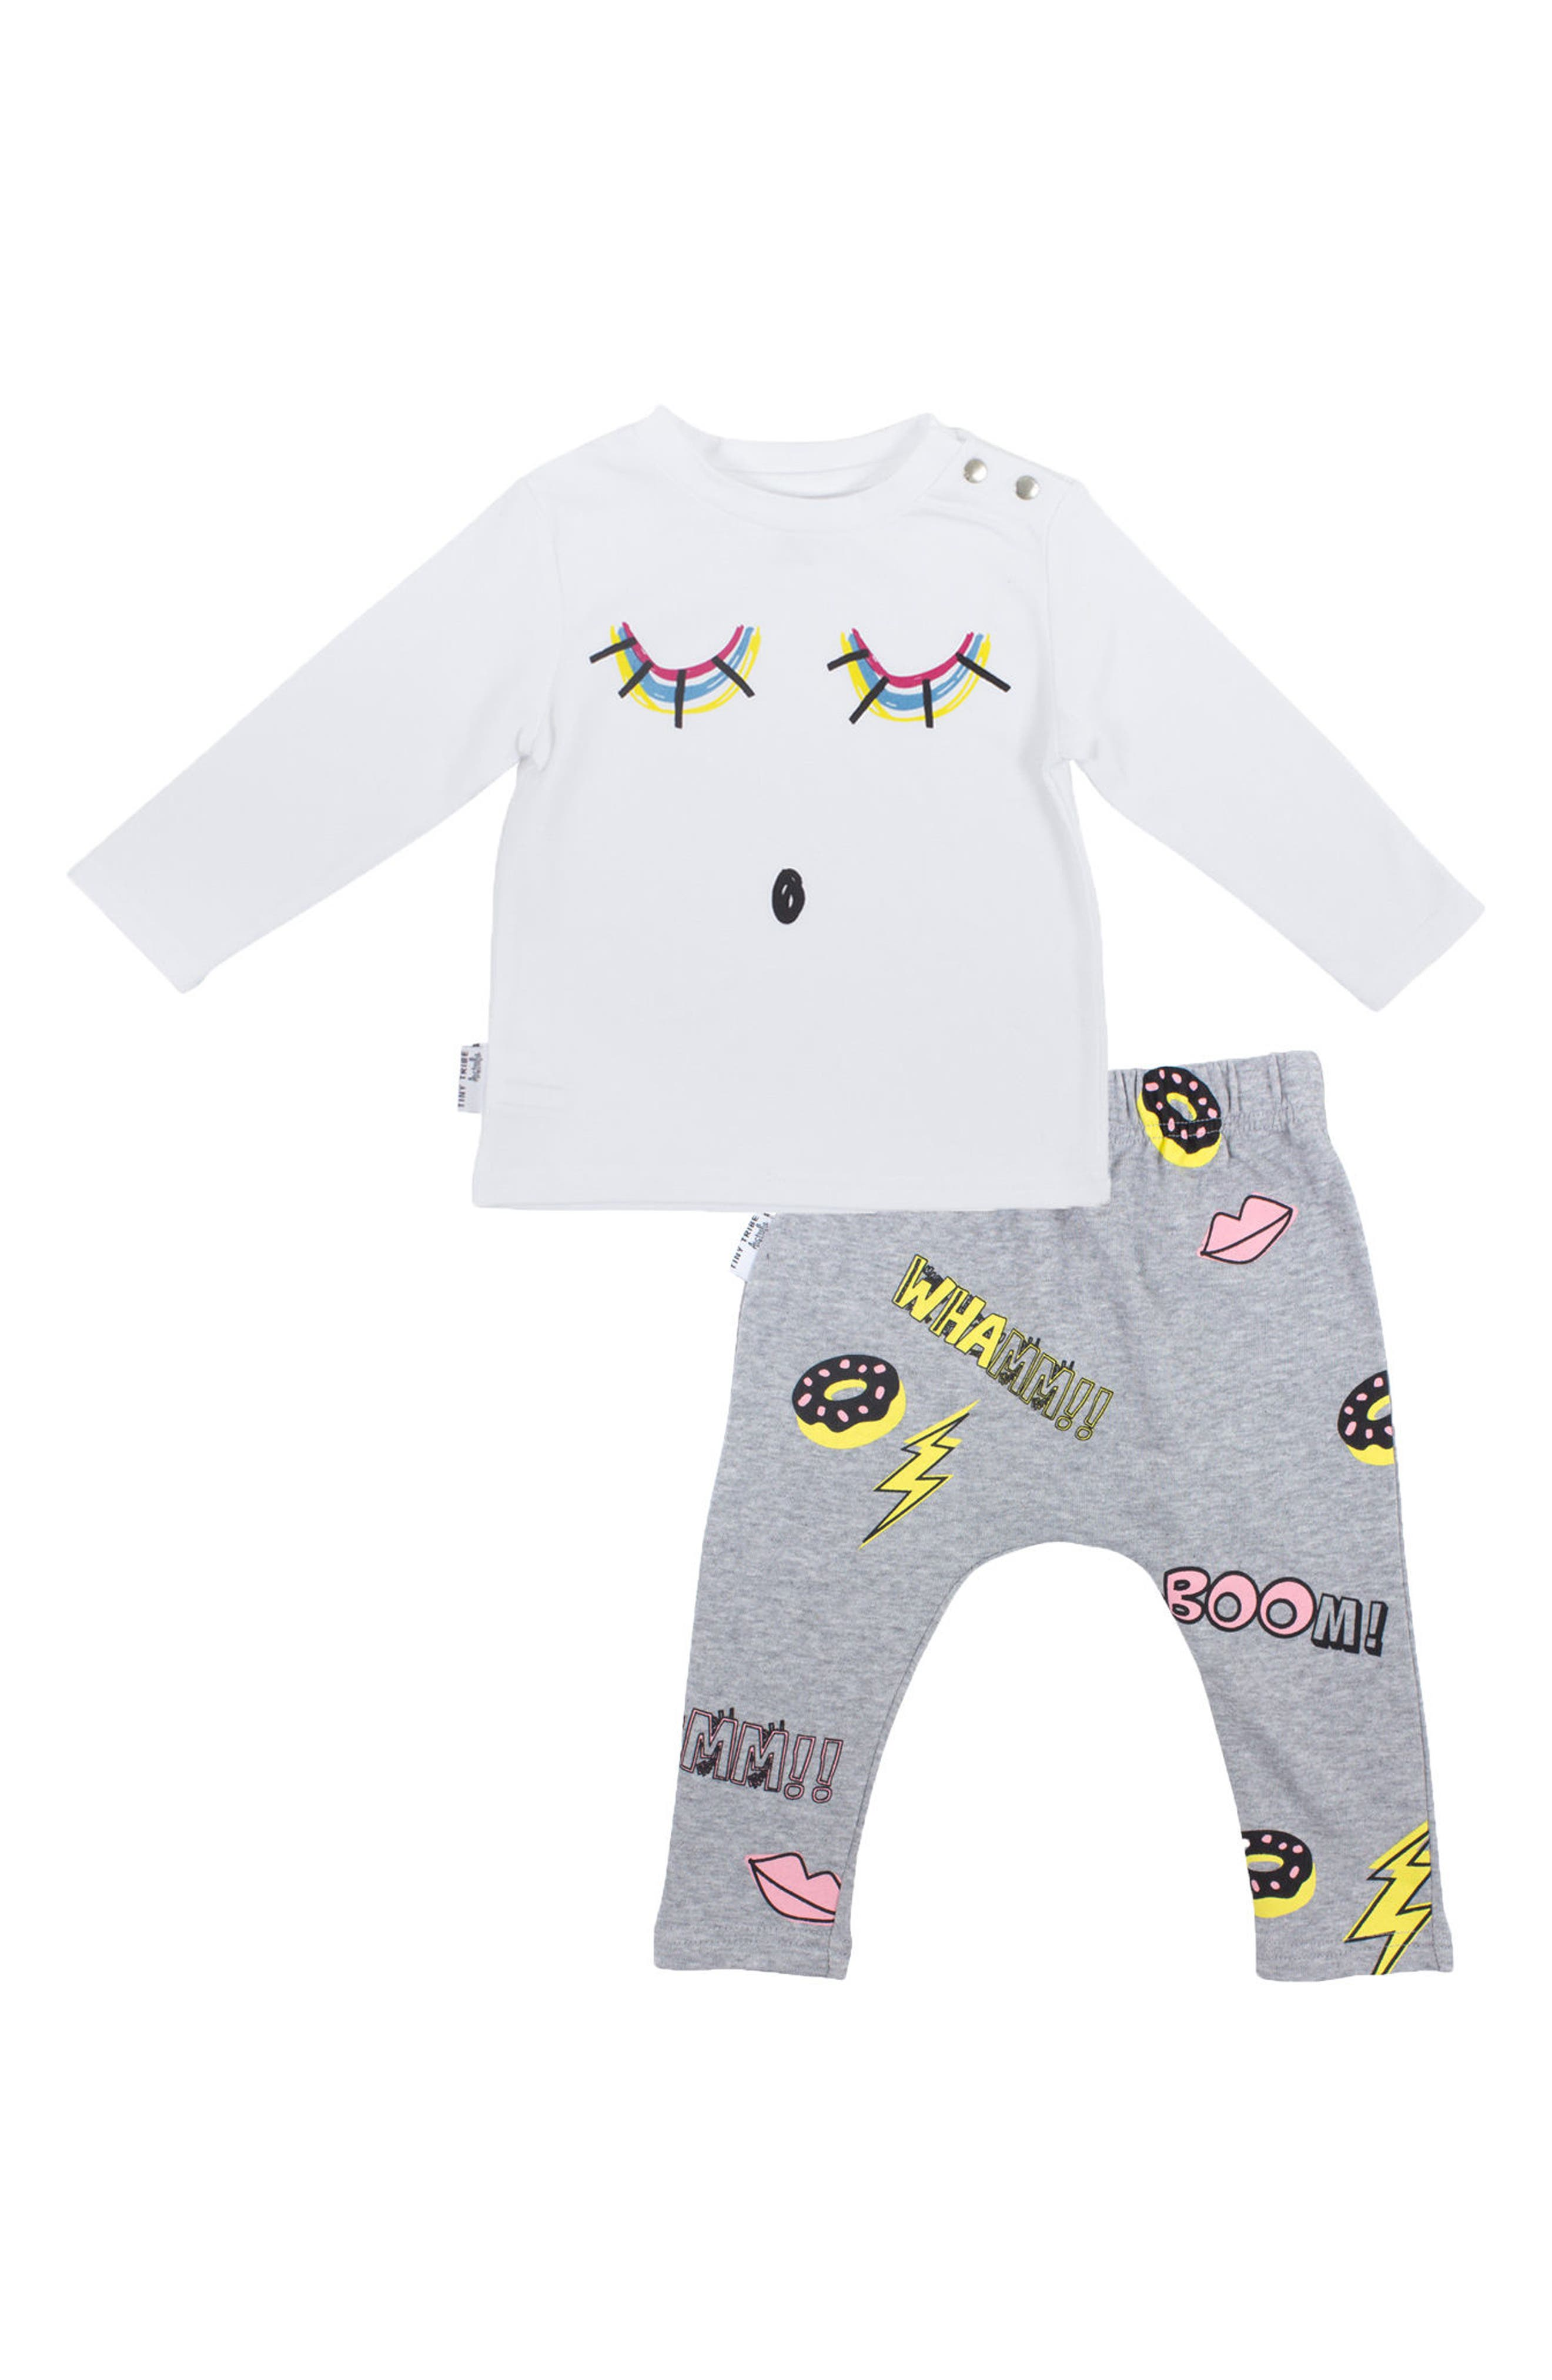 Alternate Image 1 Selected - Tiny Tribe Sleepy Kaboom Tee & Leggings Set (Baby Girls)